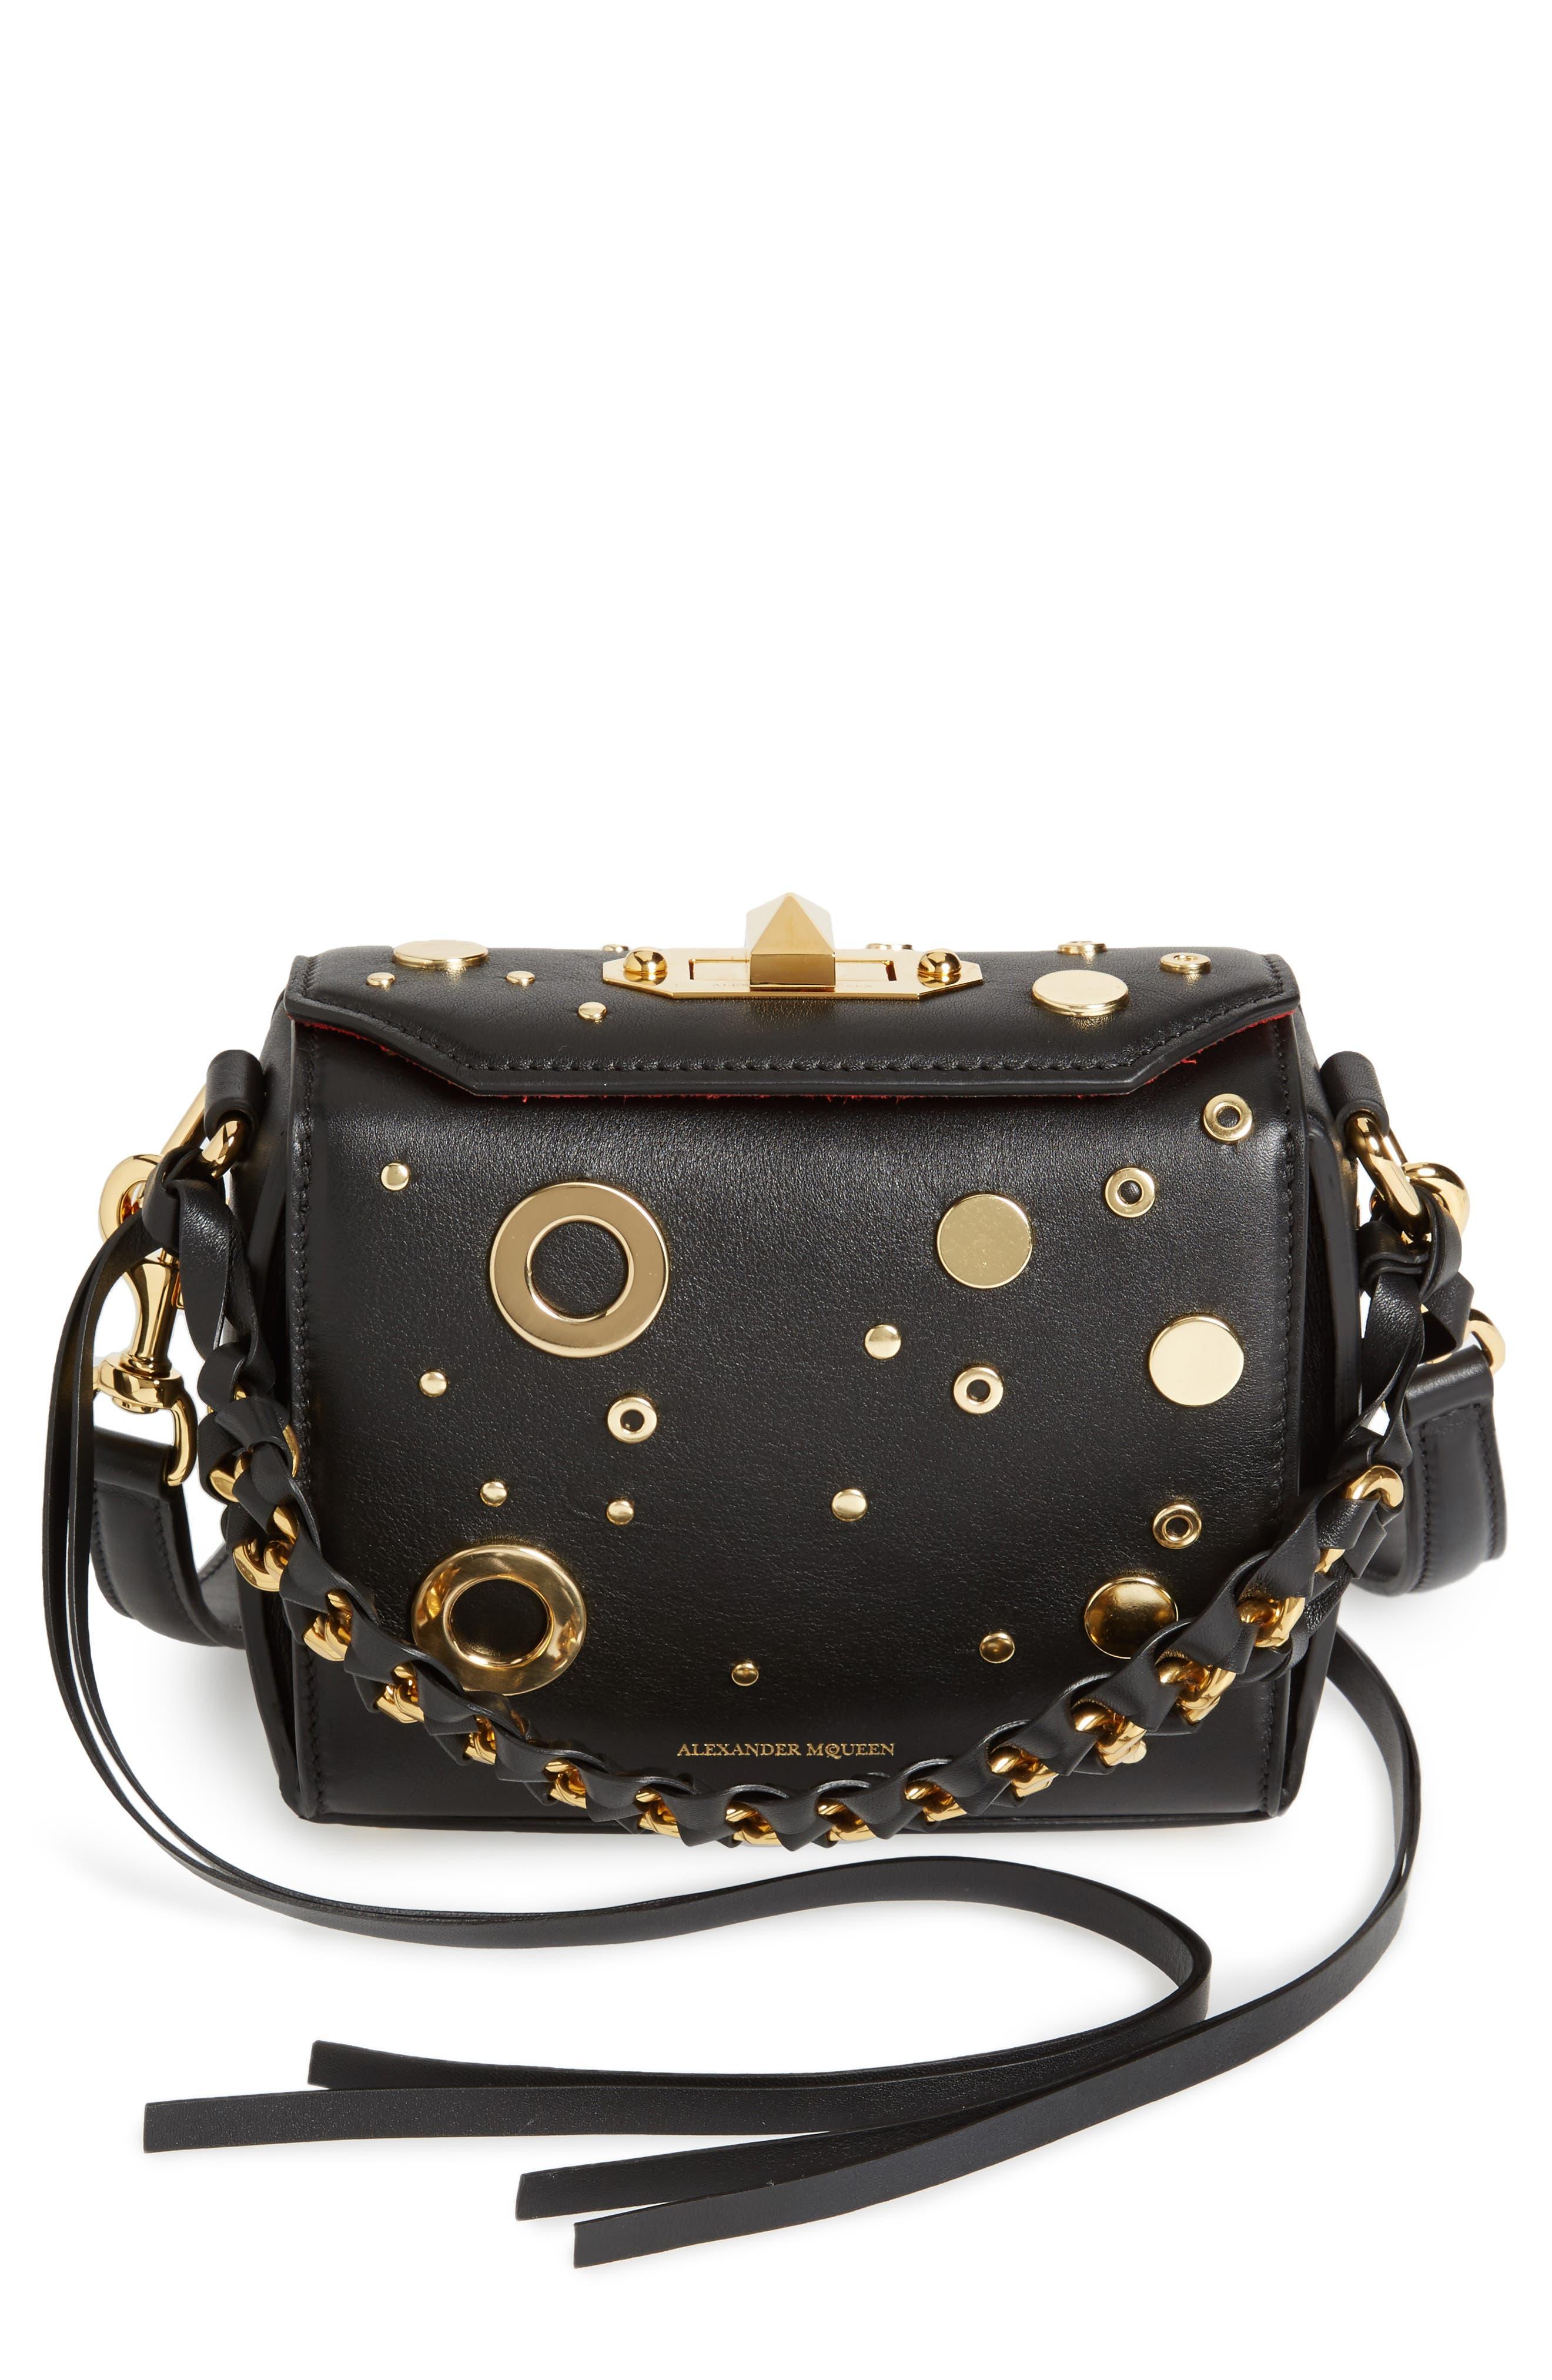 Grommet & Stud Calfskin Leather Box Bag,                             Main thumbnail 1, color,                             Black